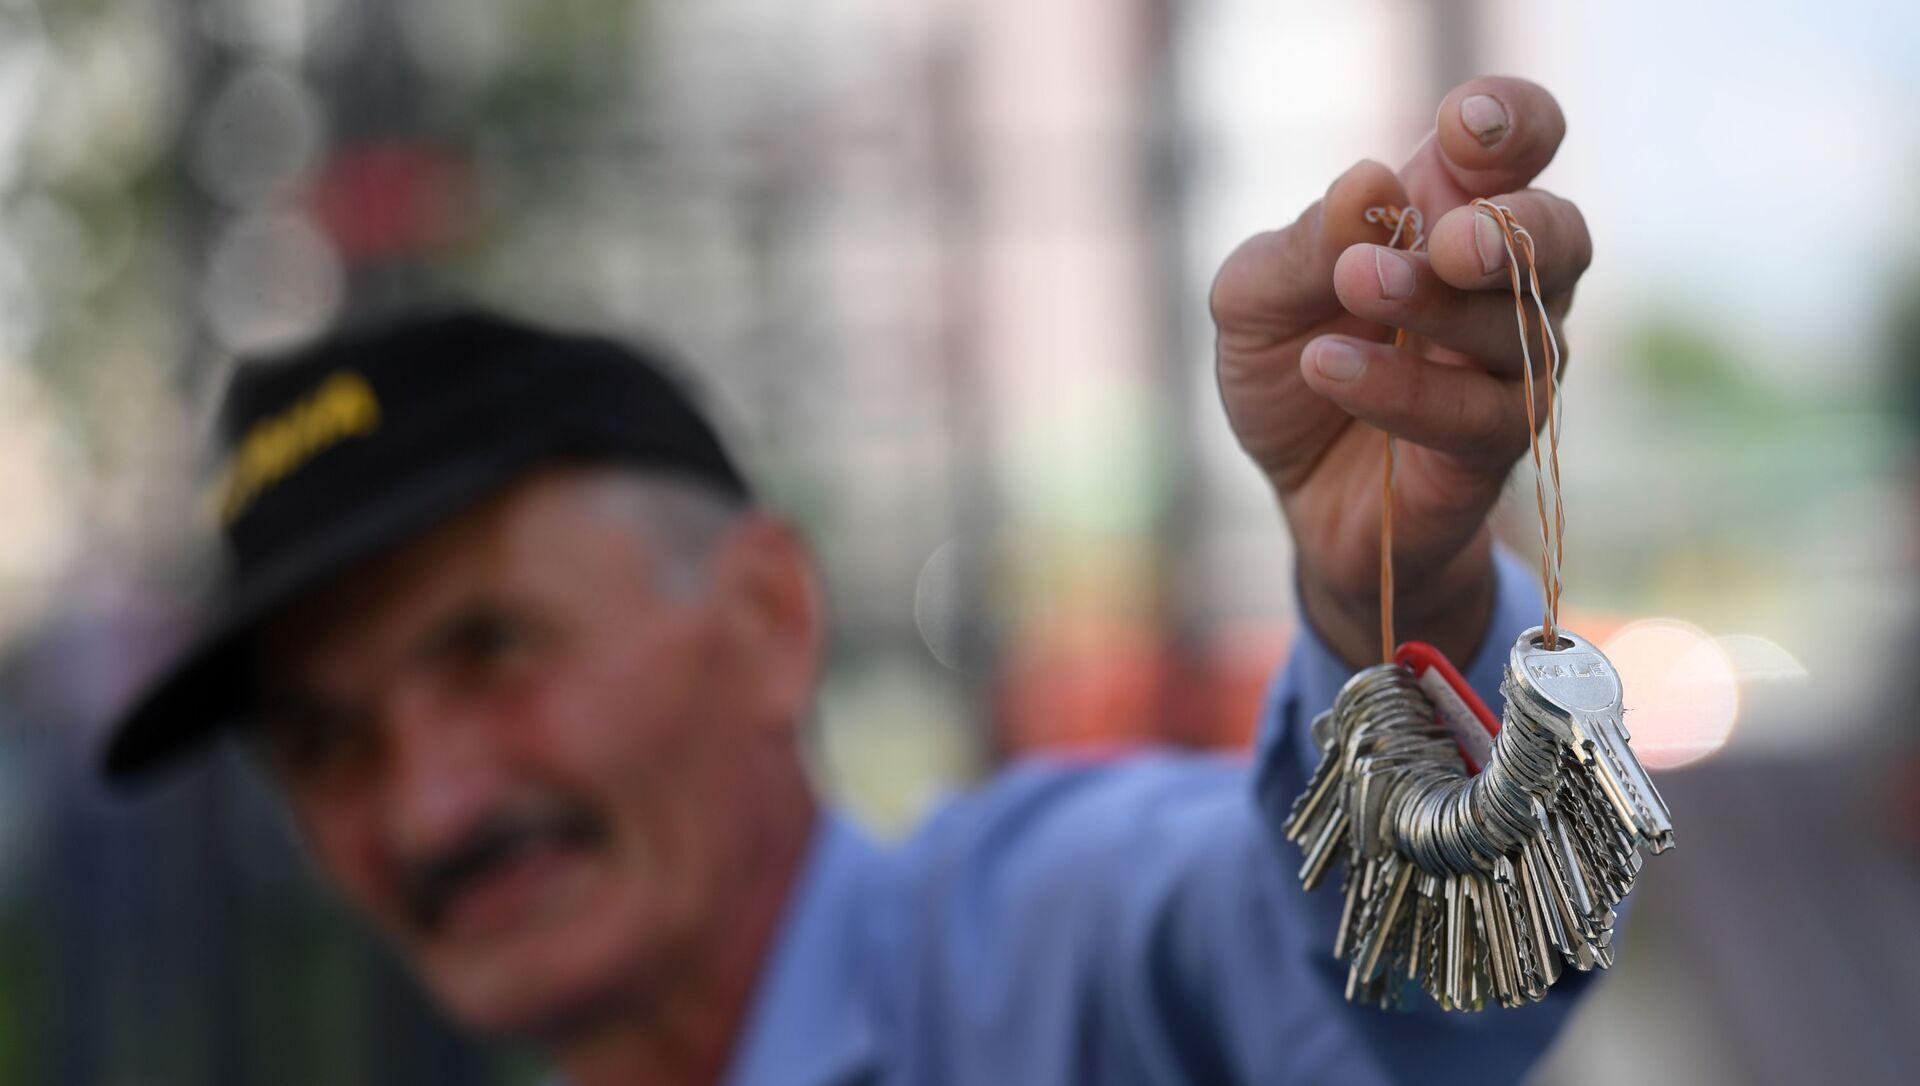 Ключи от квартир многоэтажного жилого дома, фото из архива - Sputnik Azərbaycan, 1920, 03.09.2021